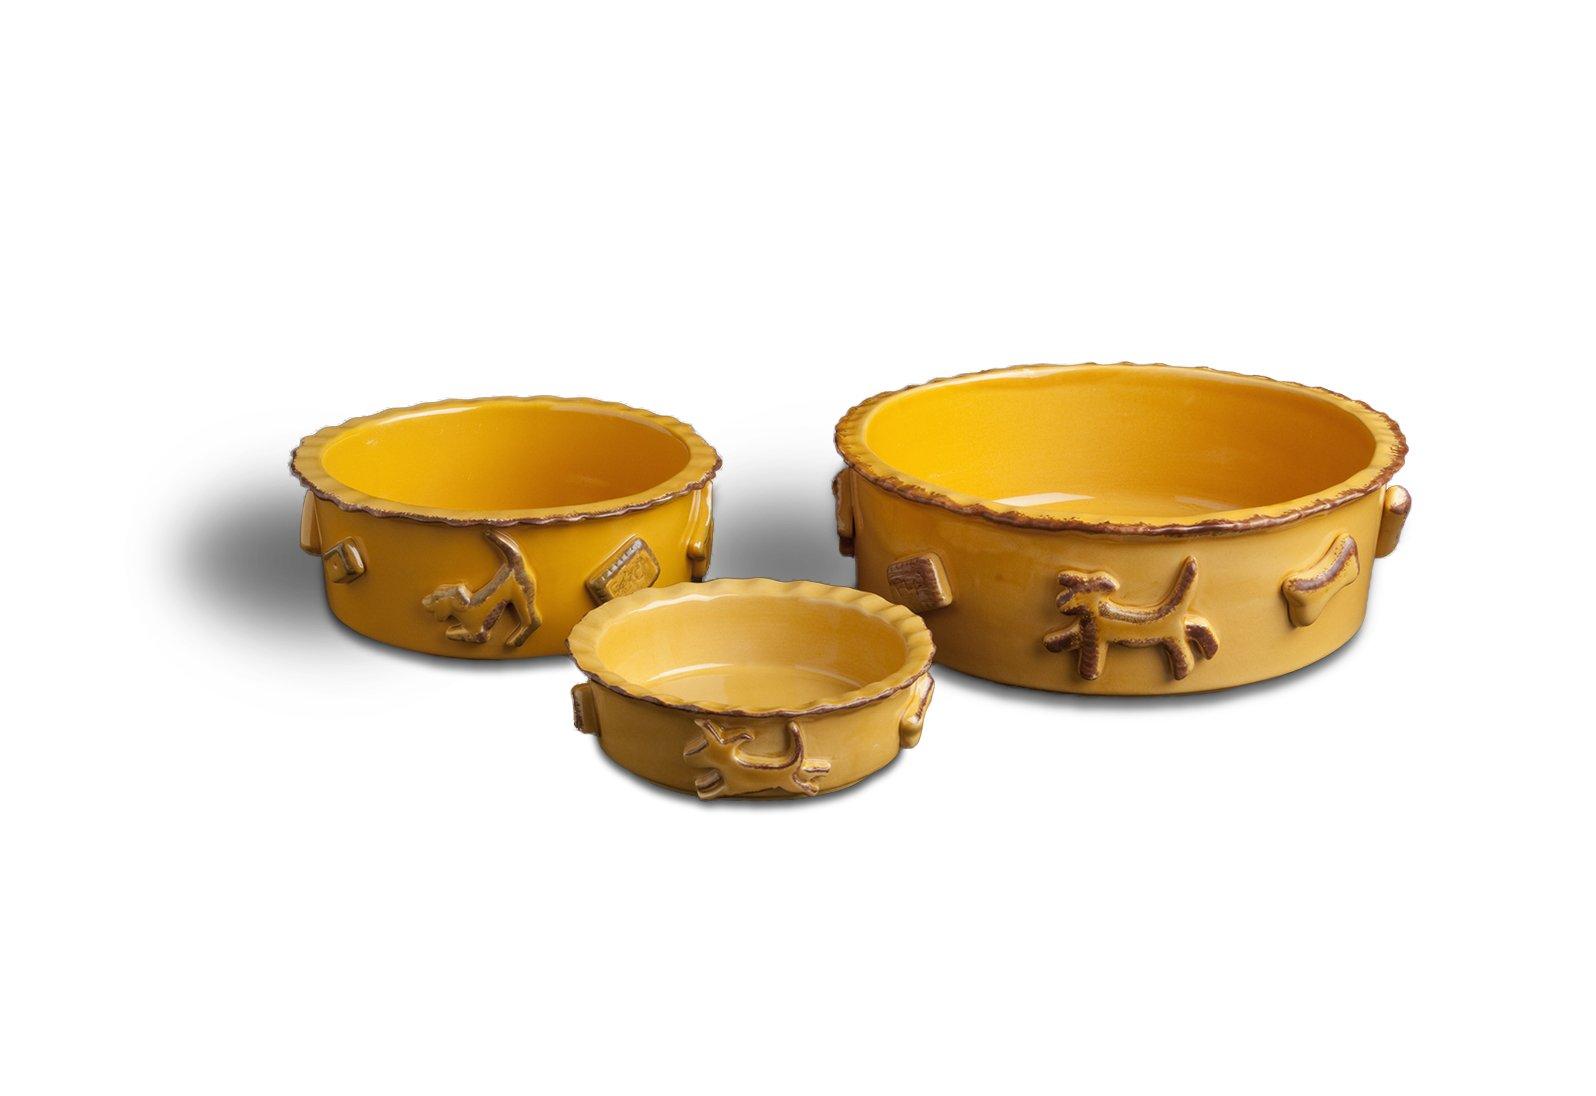 Carmel Ceramica PDLC3005 Caramel Dog Food/Water Bowl, Large